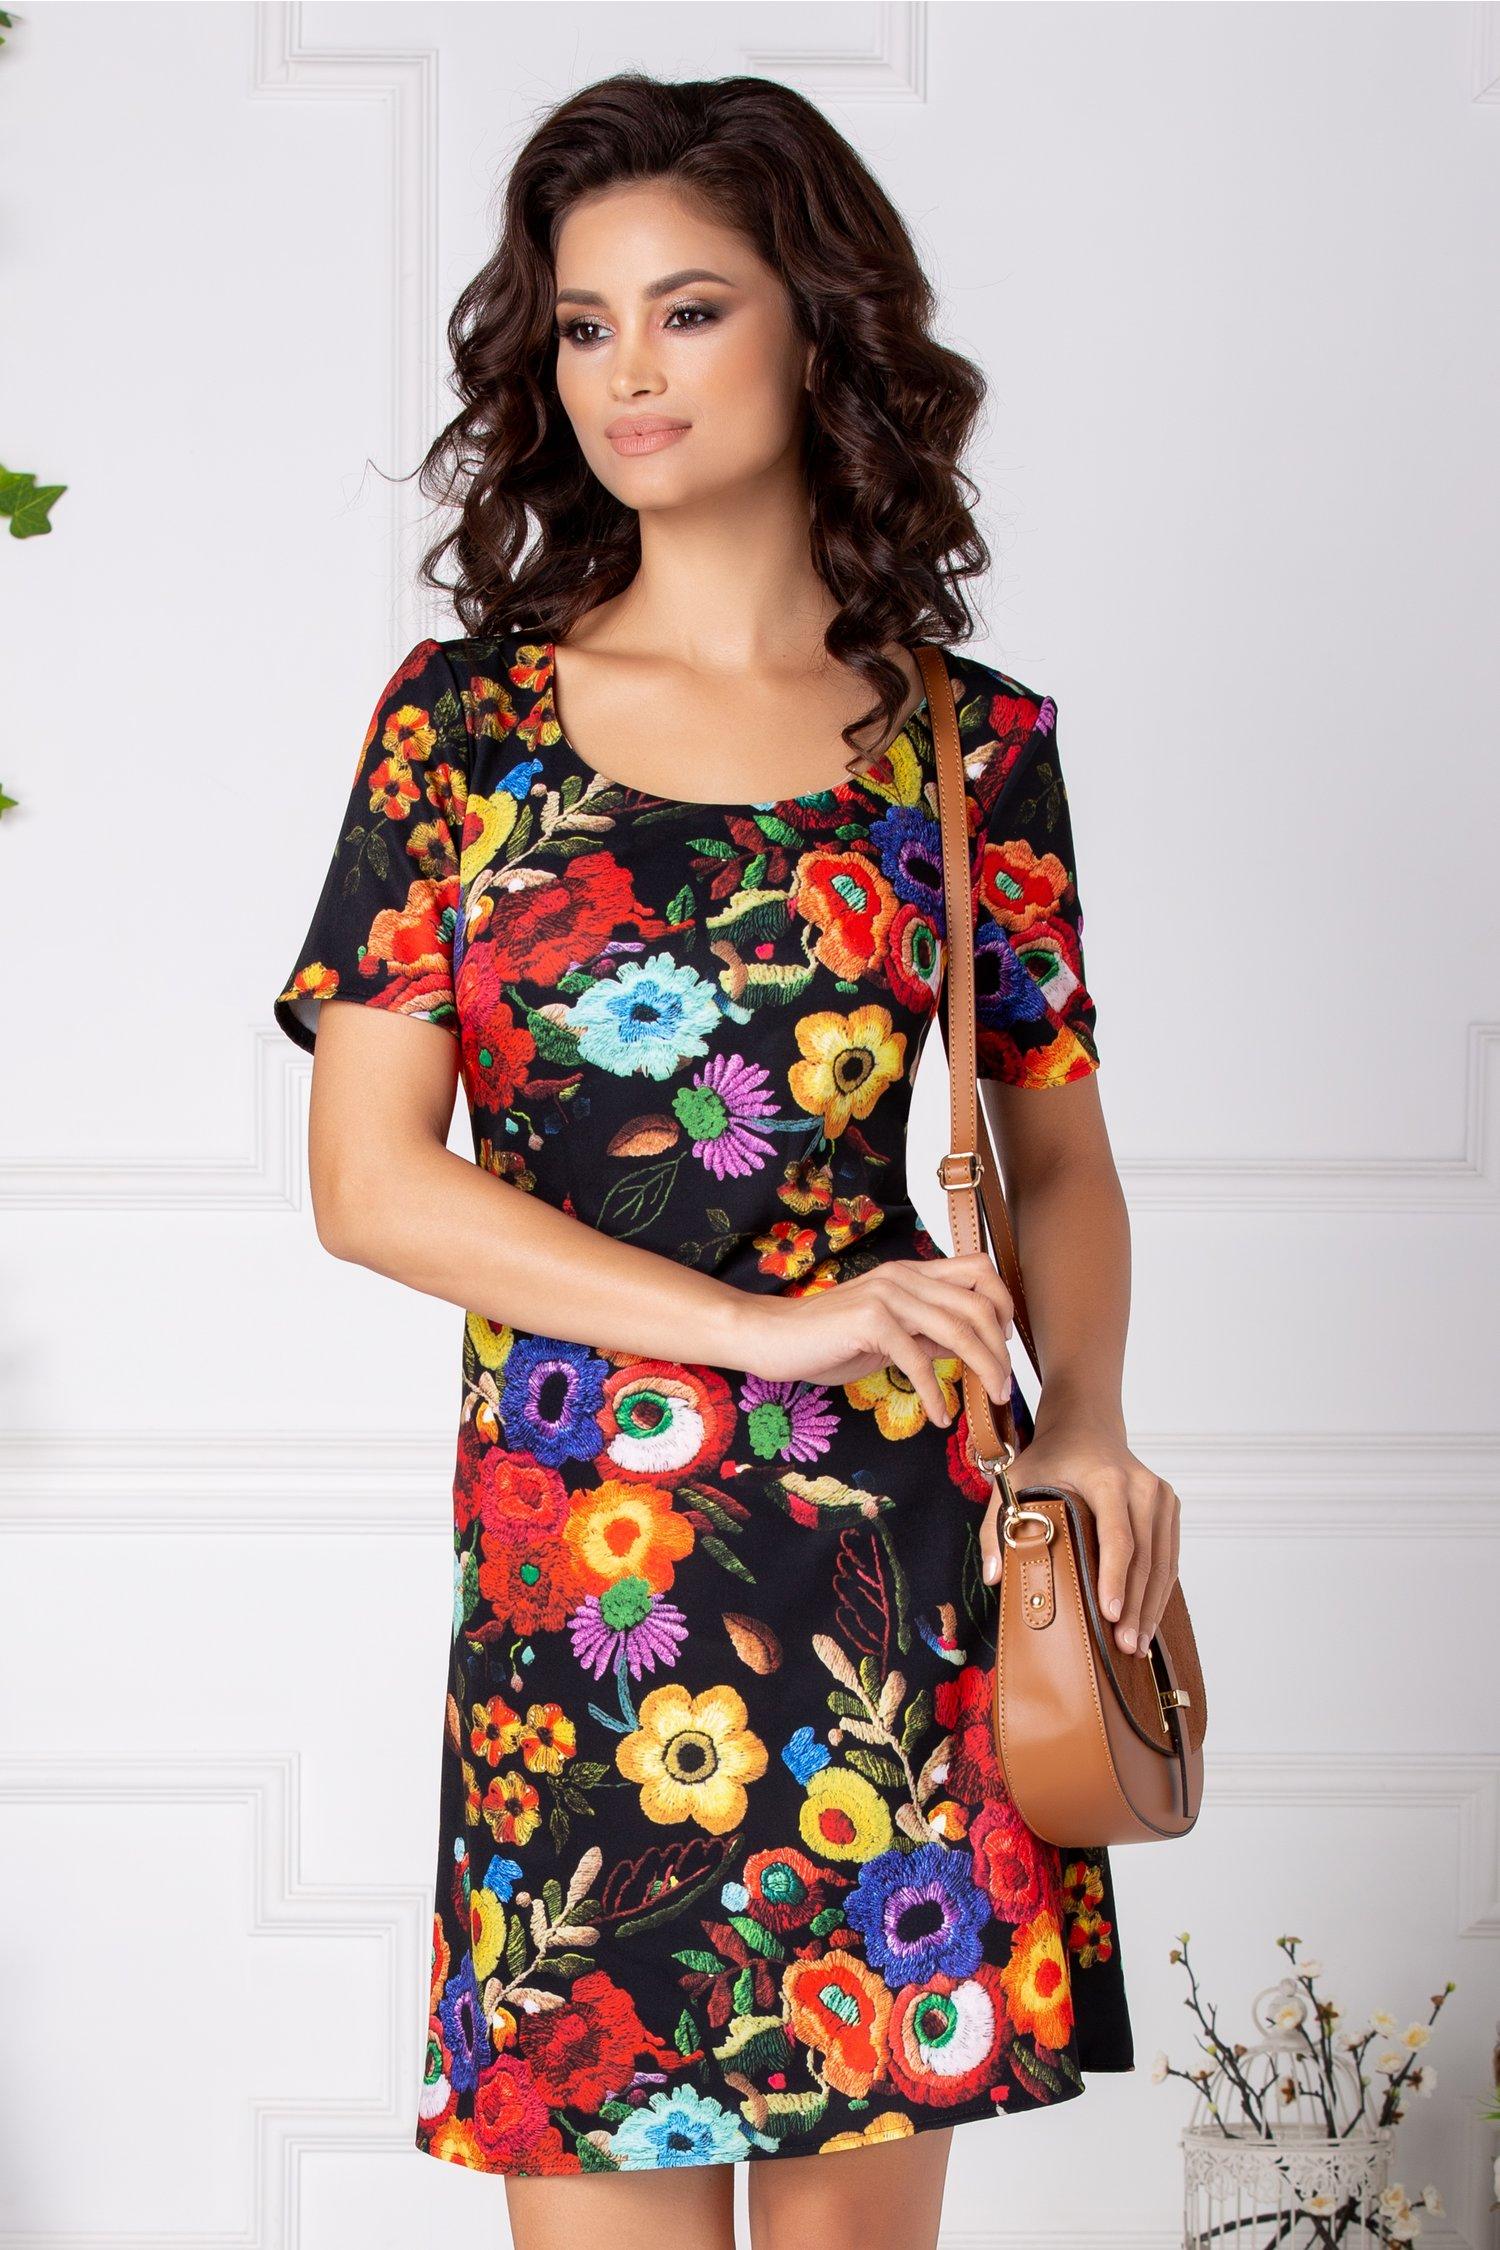 Rochie Mira neagra dreapta cu imprimeu floral colorat